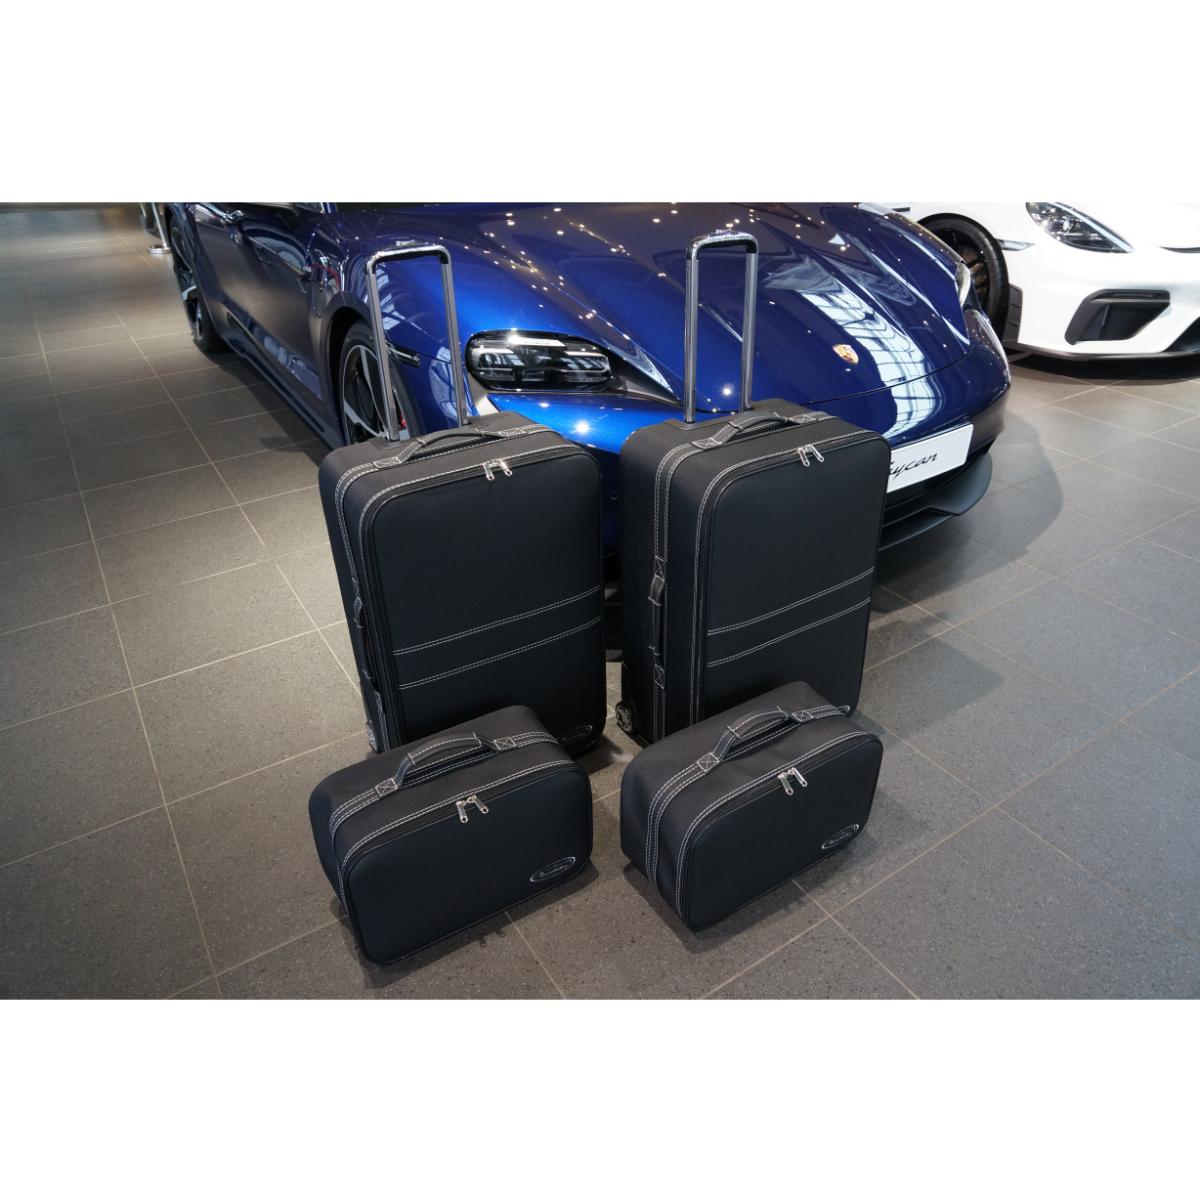 4-tlg. Kofferset Porsche Taycan back (133B) - Leder / Nylon